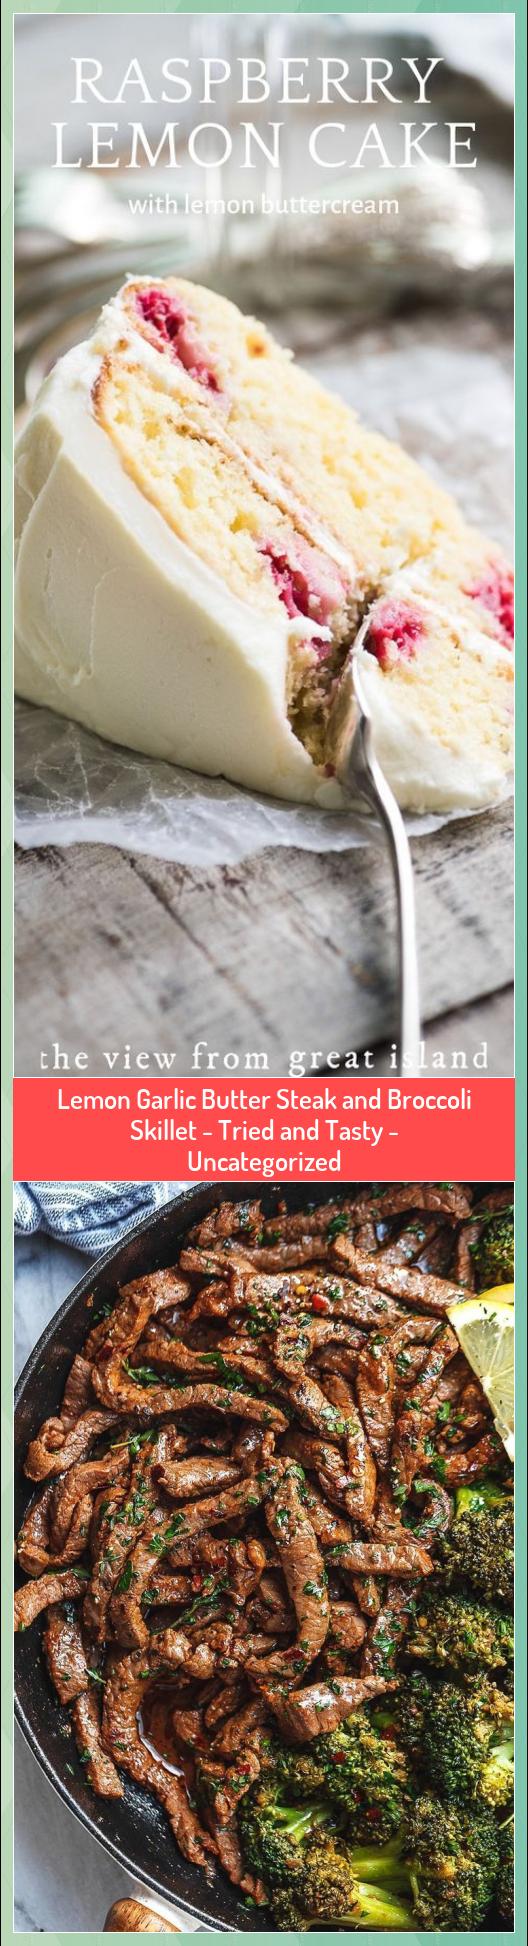 Lemon Garlic Butter Steak and Broccoli Skillet  Tried and Tasty  Uncategorized